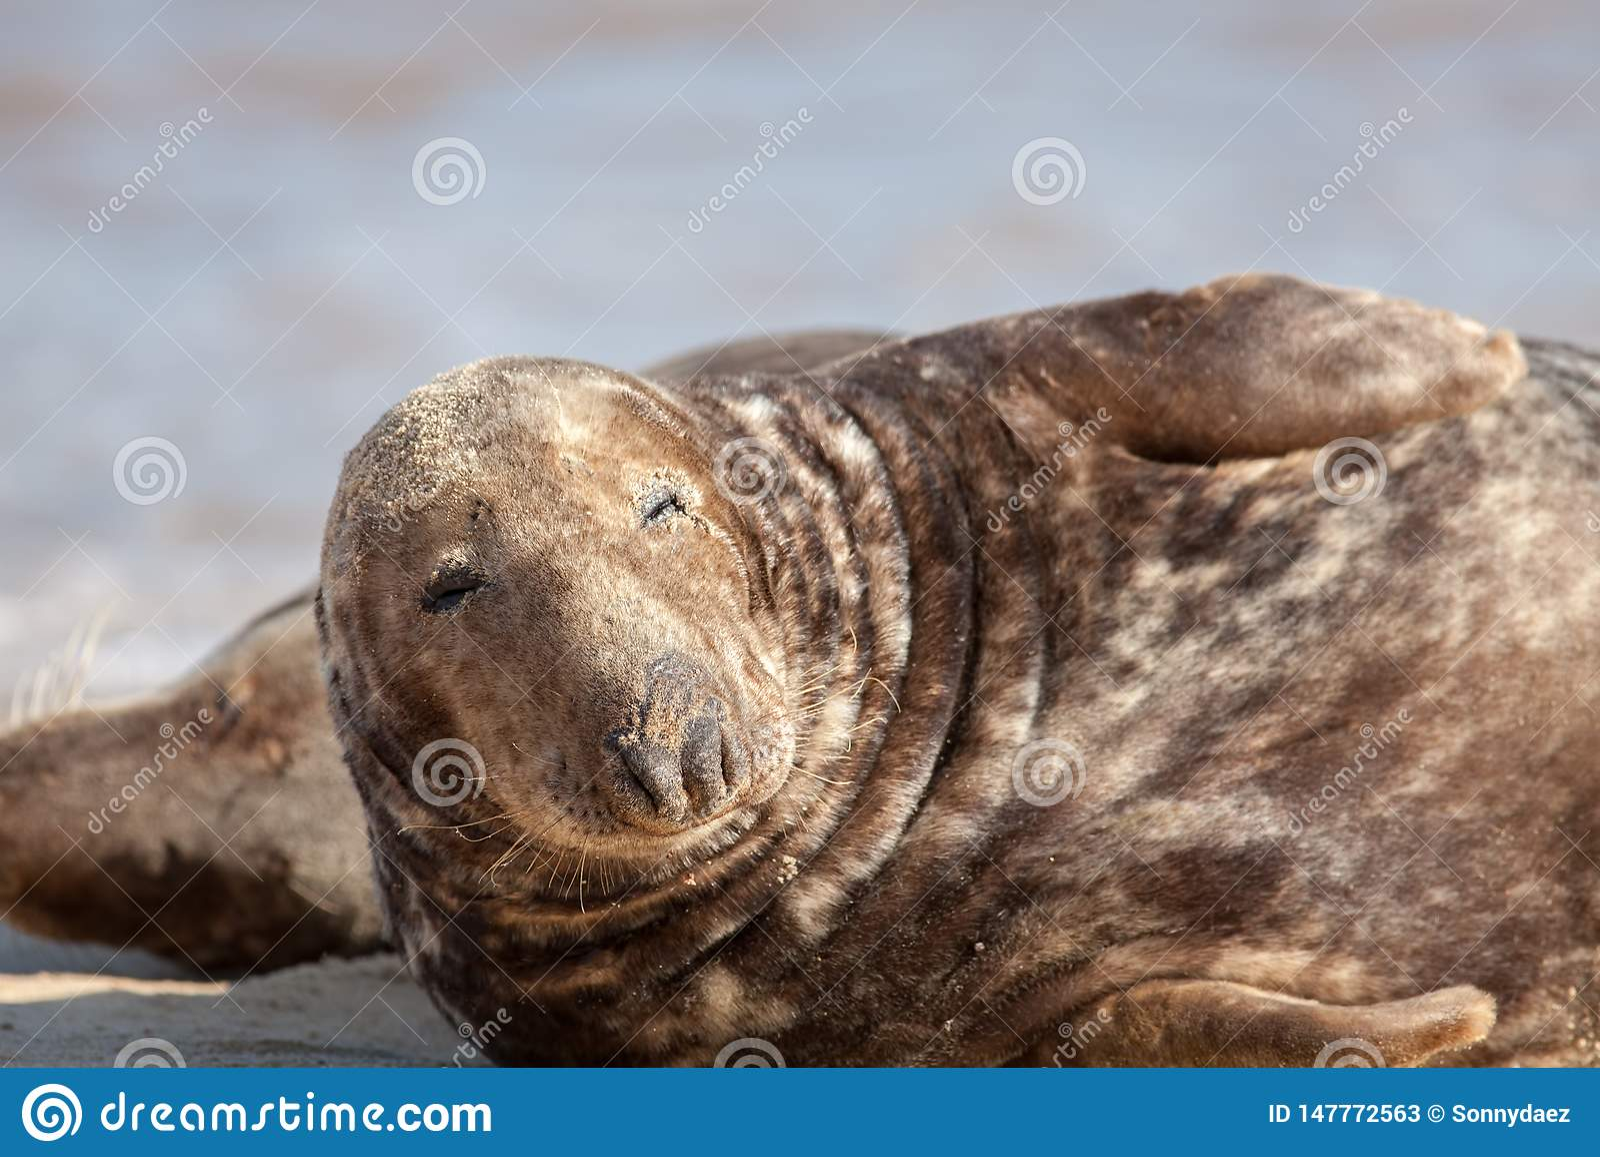 Dozy animal. Sleepy lethargic seal feeling drowsy. Eyes half closed